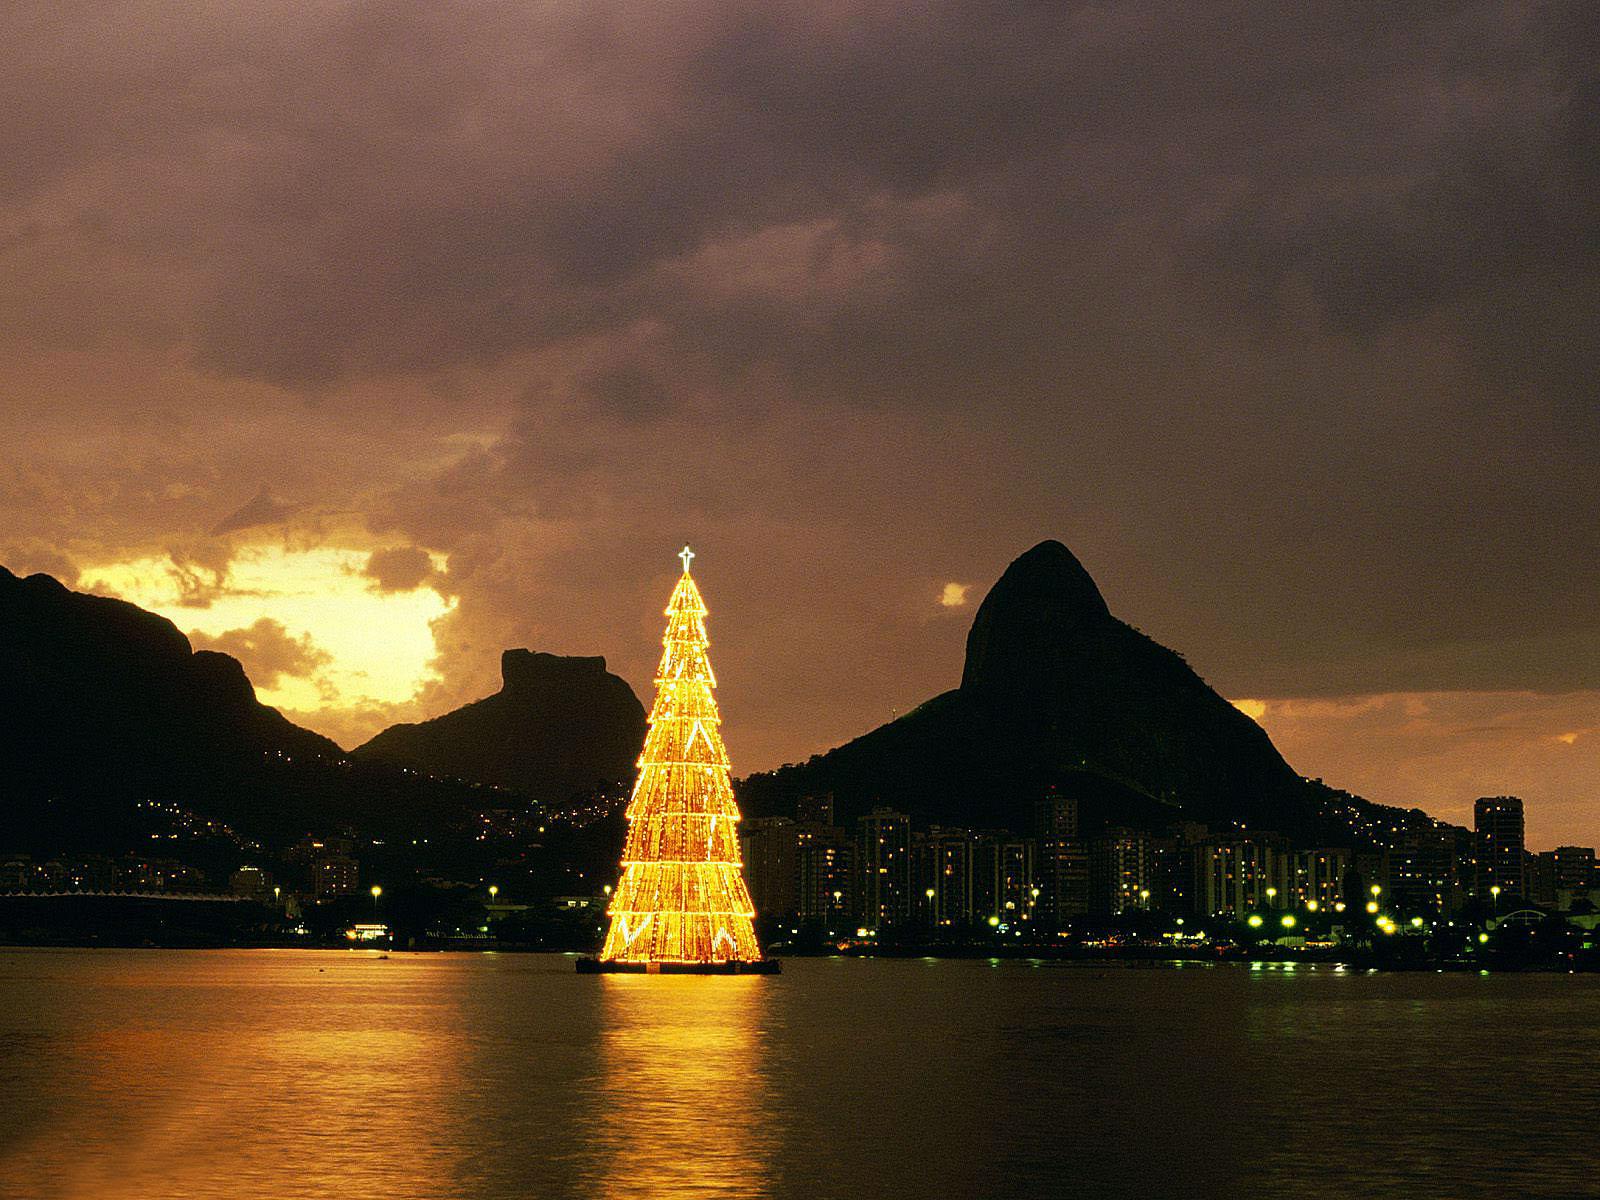 http://2.bp.blogspot.com/-mzMg9c6UbdA/T7JiKeNHbtI/AAAAAAAACzM/I4orsBpLGCk/s1600/Christmas+Lights+4.jpg